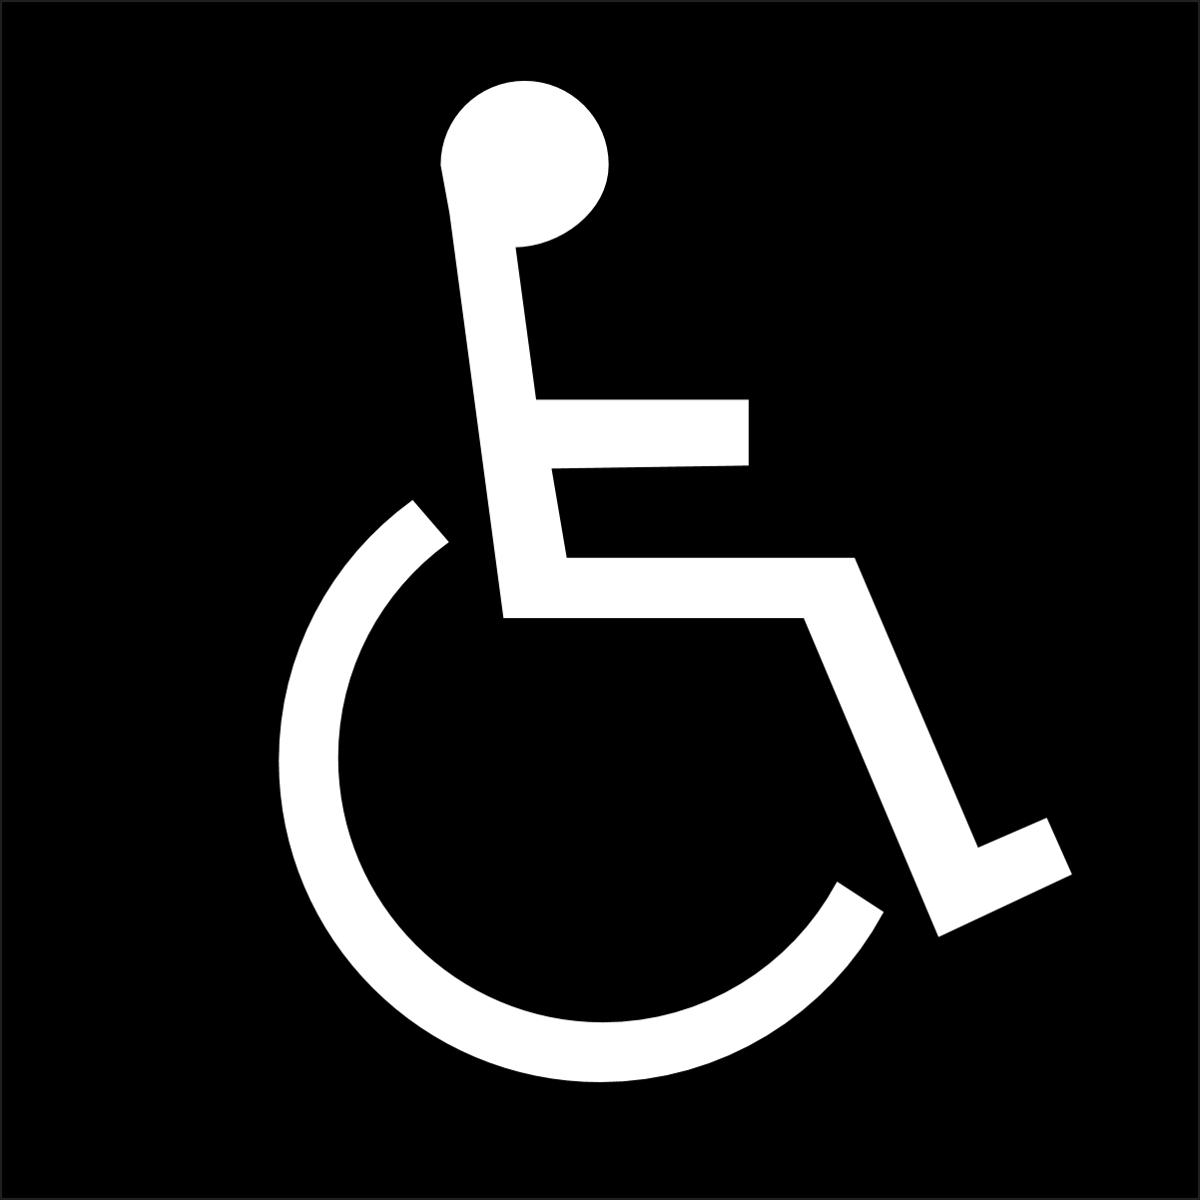 brady part 70123 braille ada handicap sign bradyid com